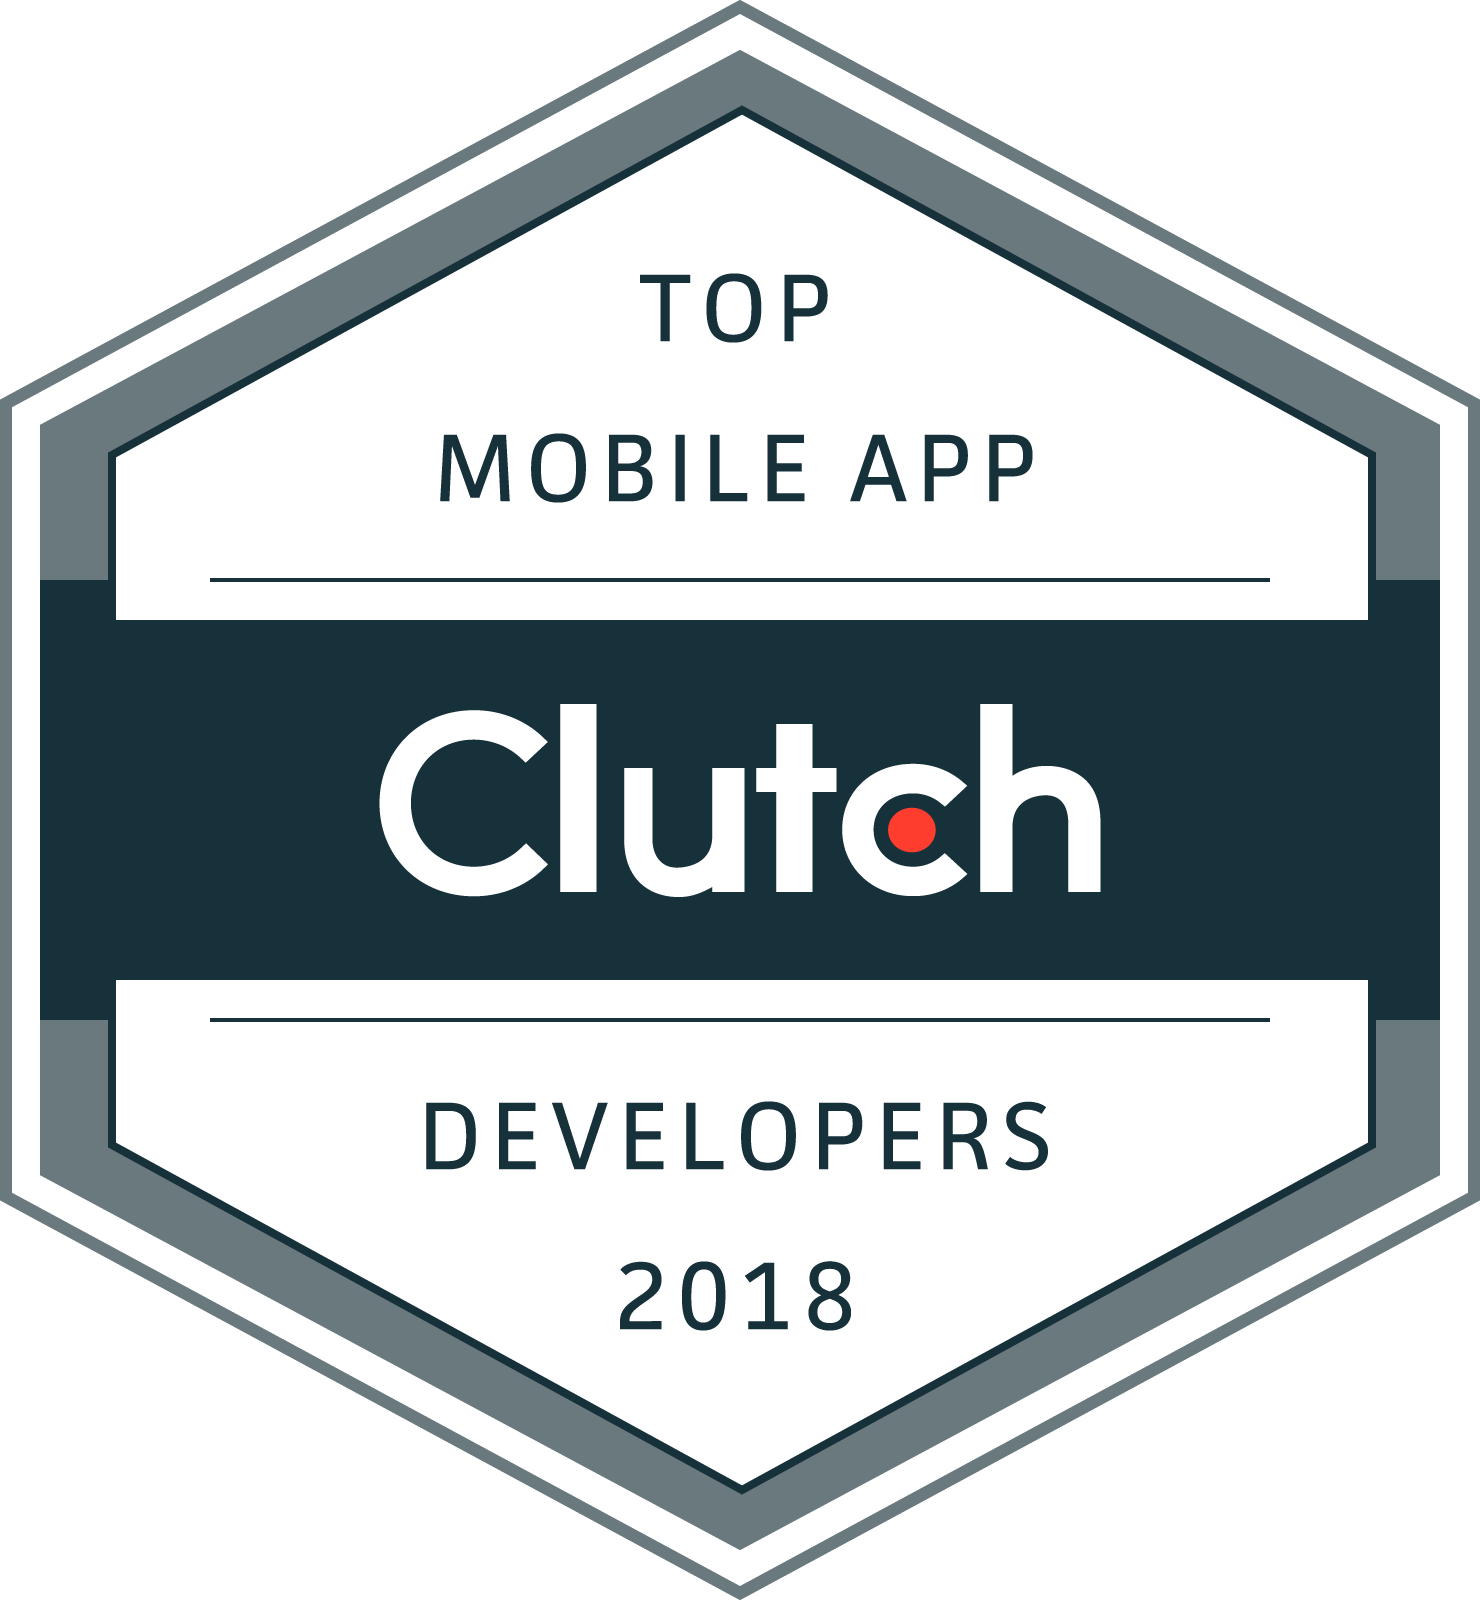 Clutch_Mobile_App_Developers_2018